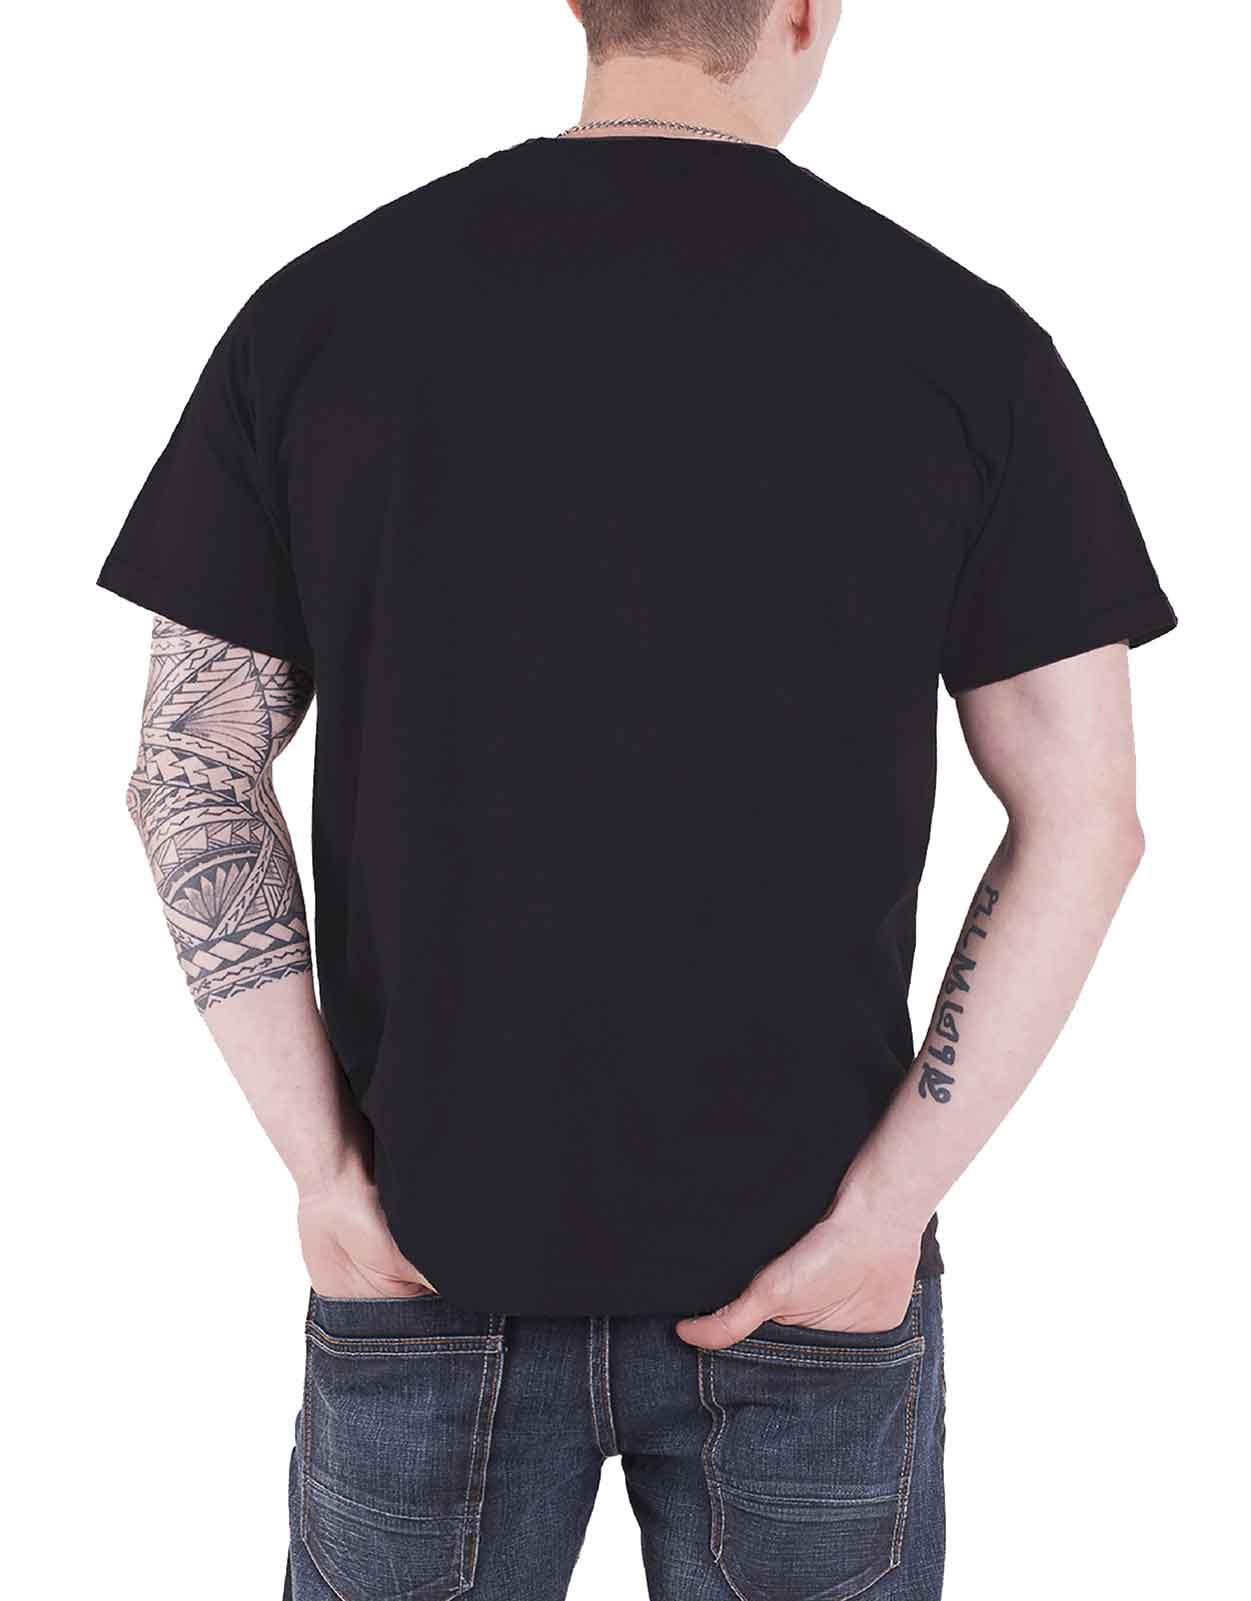 Misfits-T-Shirt-Official-fiend-Skull-Band-Logo-Die-Die-My-Darling-Mens-New thumbnail 11